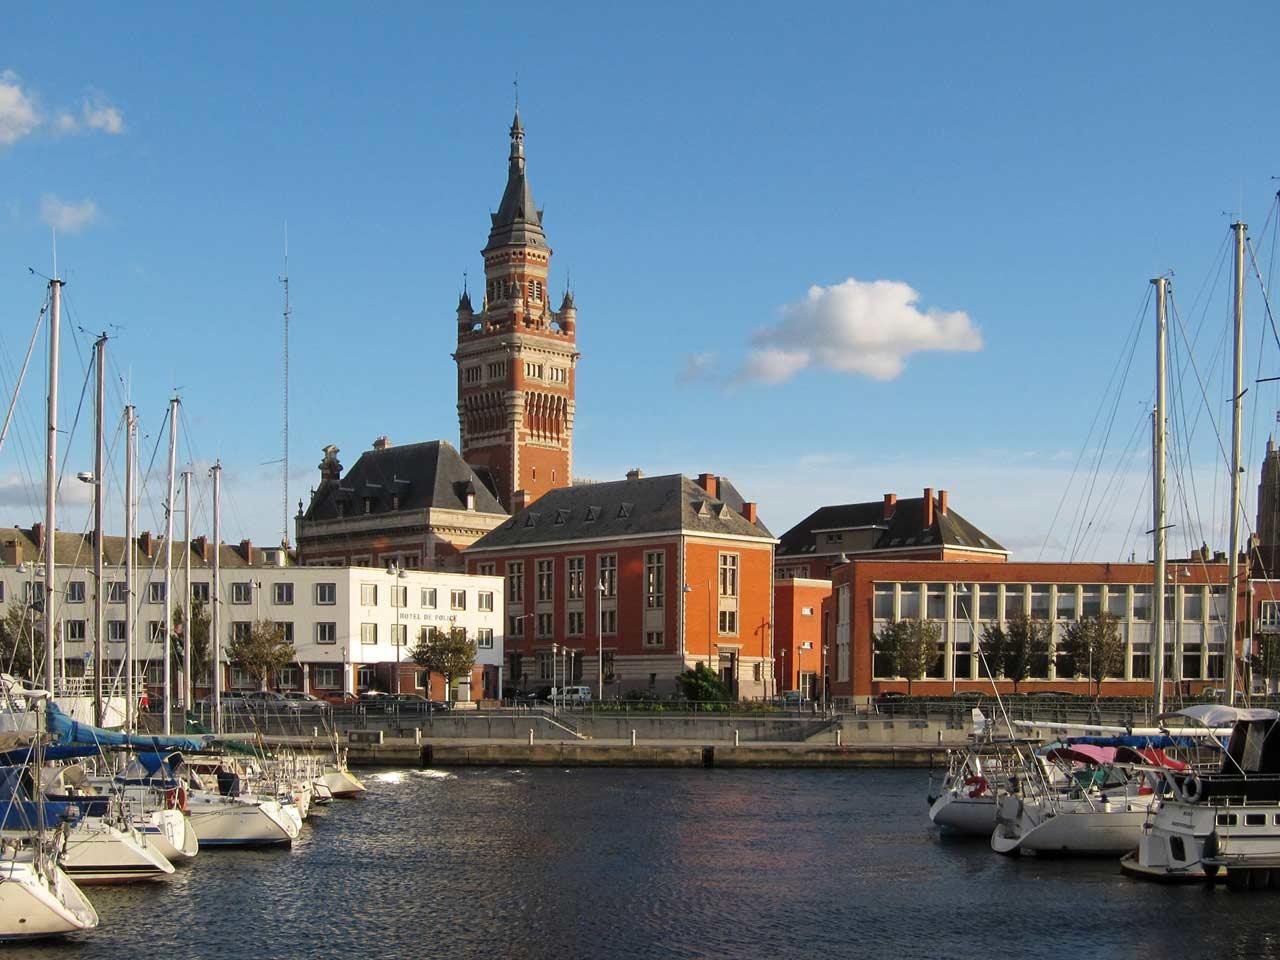 Hôtel de Ville de Dunkerque vu du port